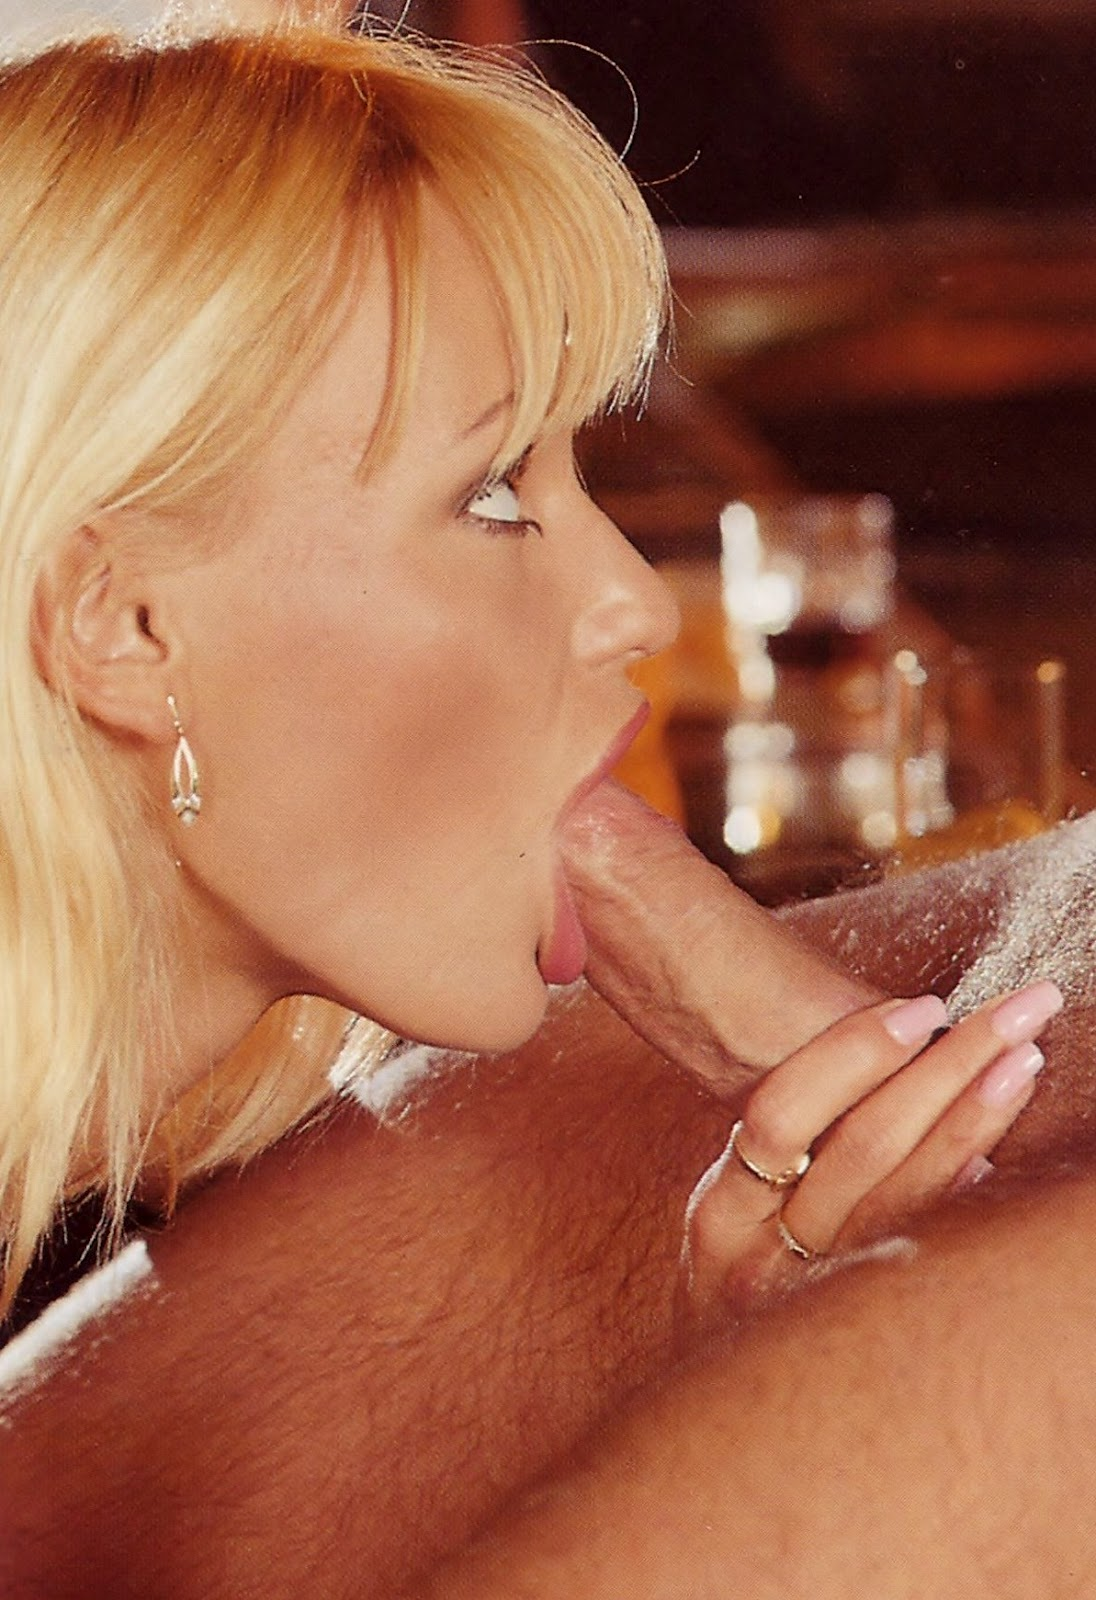 анита блонд и молоко